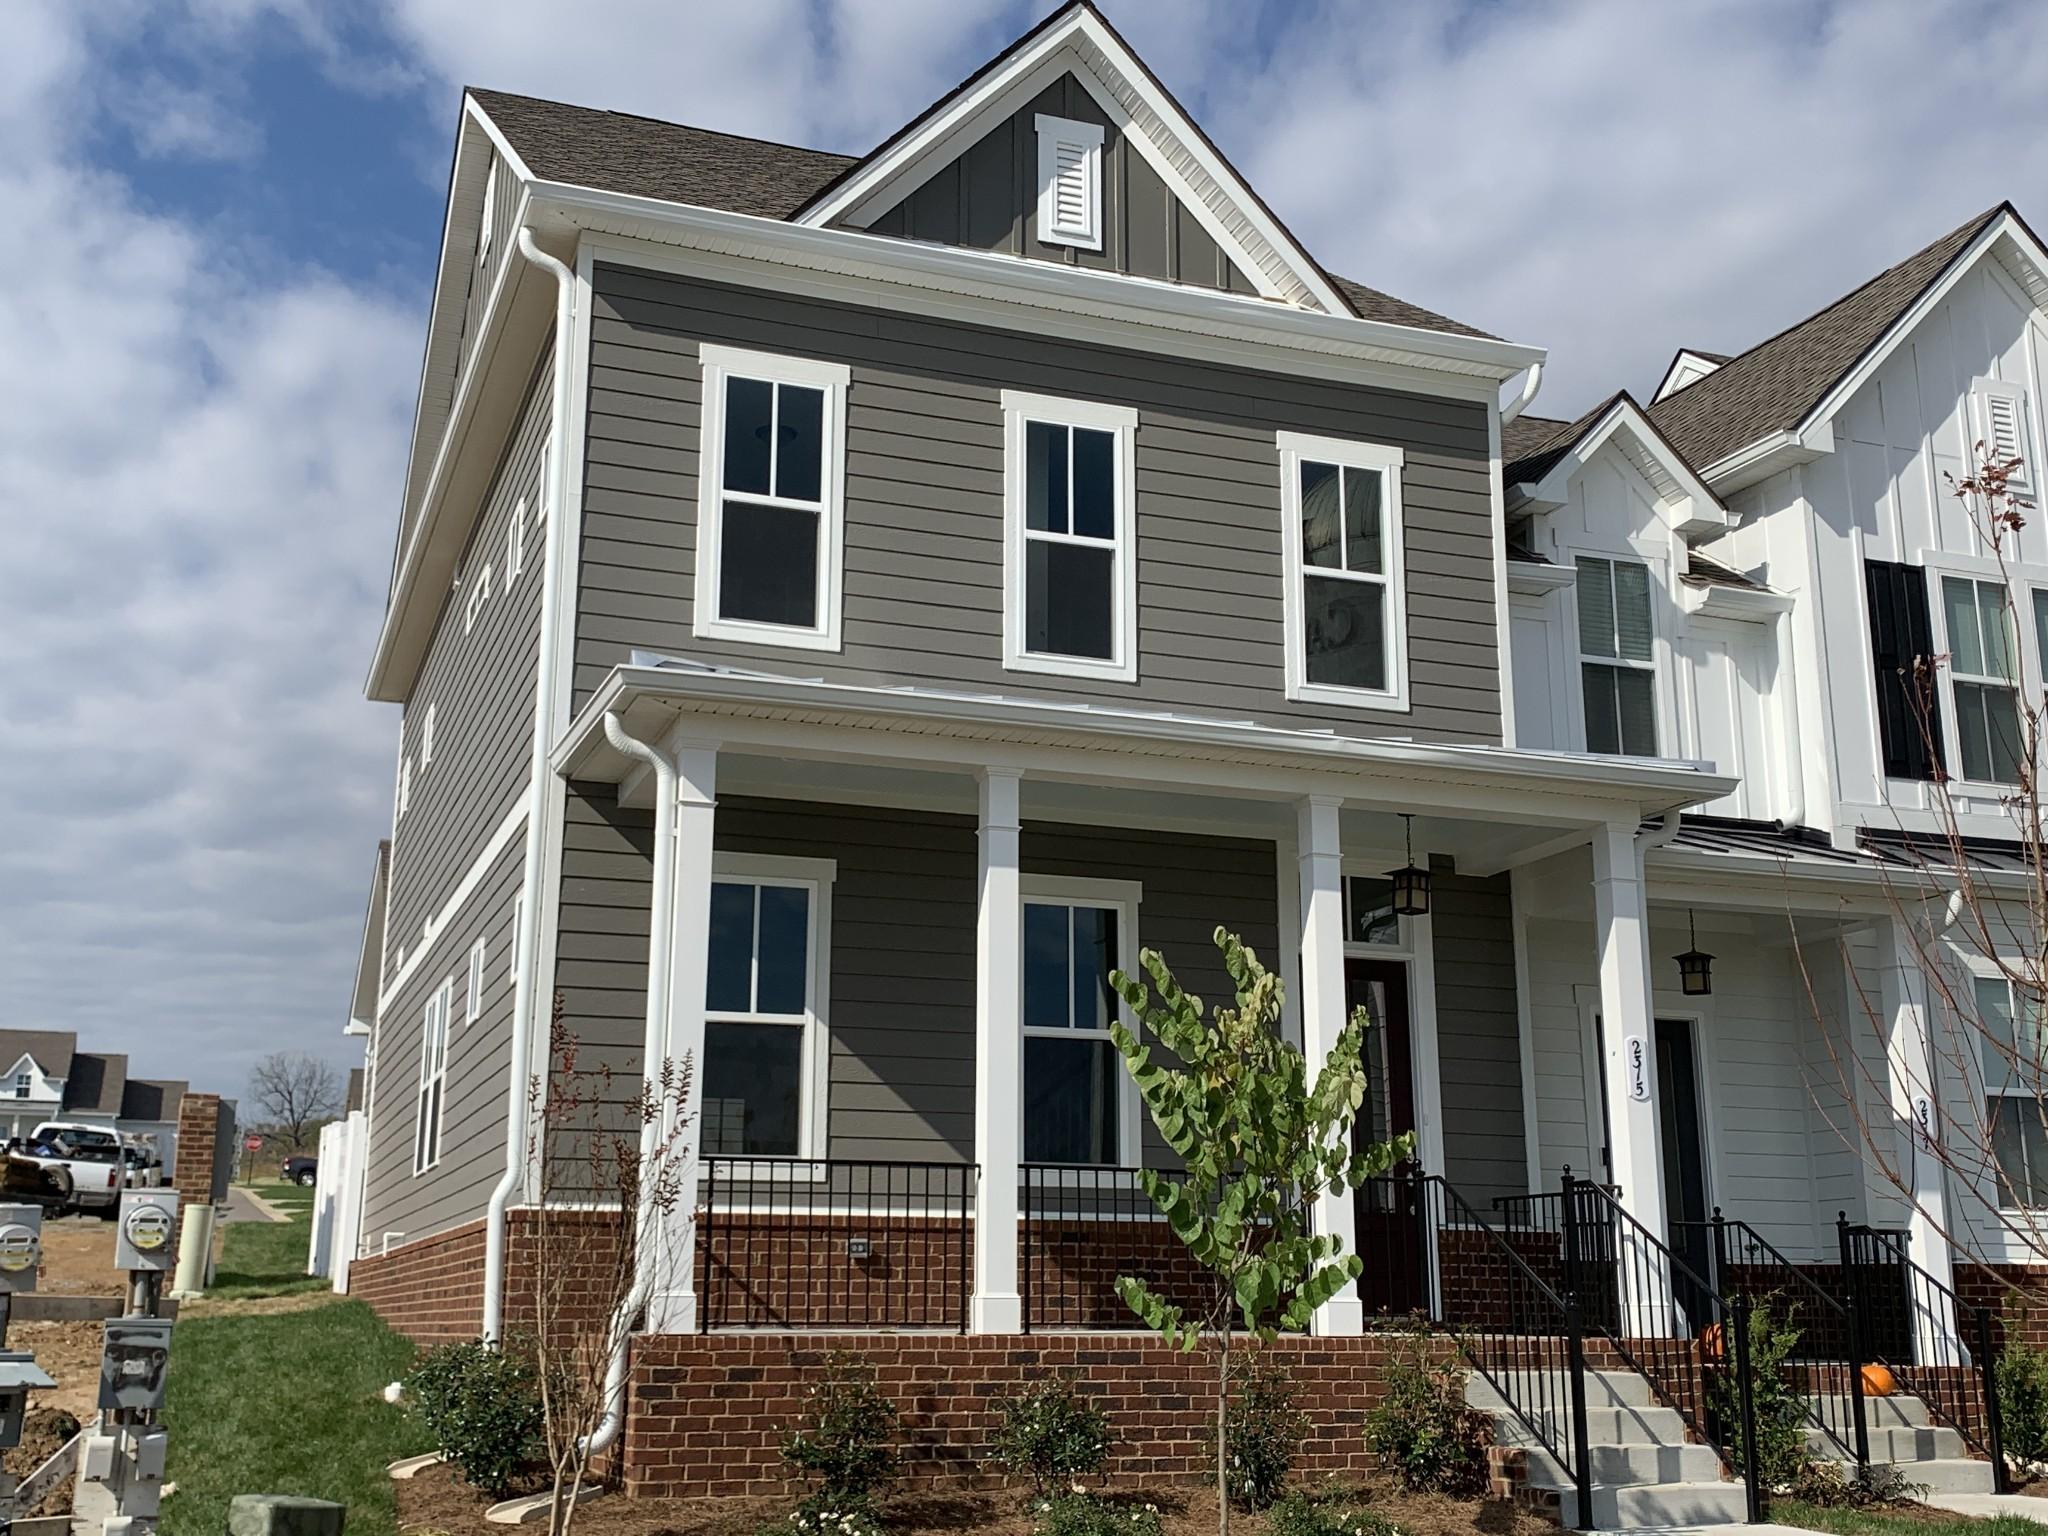 2315 Fairchild Circle #172, Nolensville, TN 37135 - Nolensville, TN real estate listing